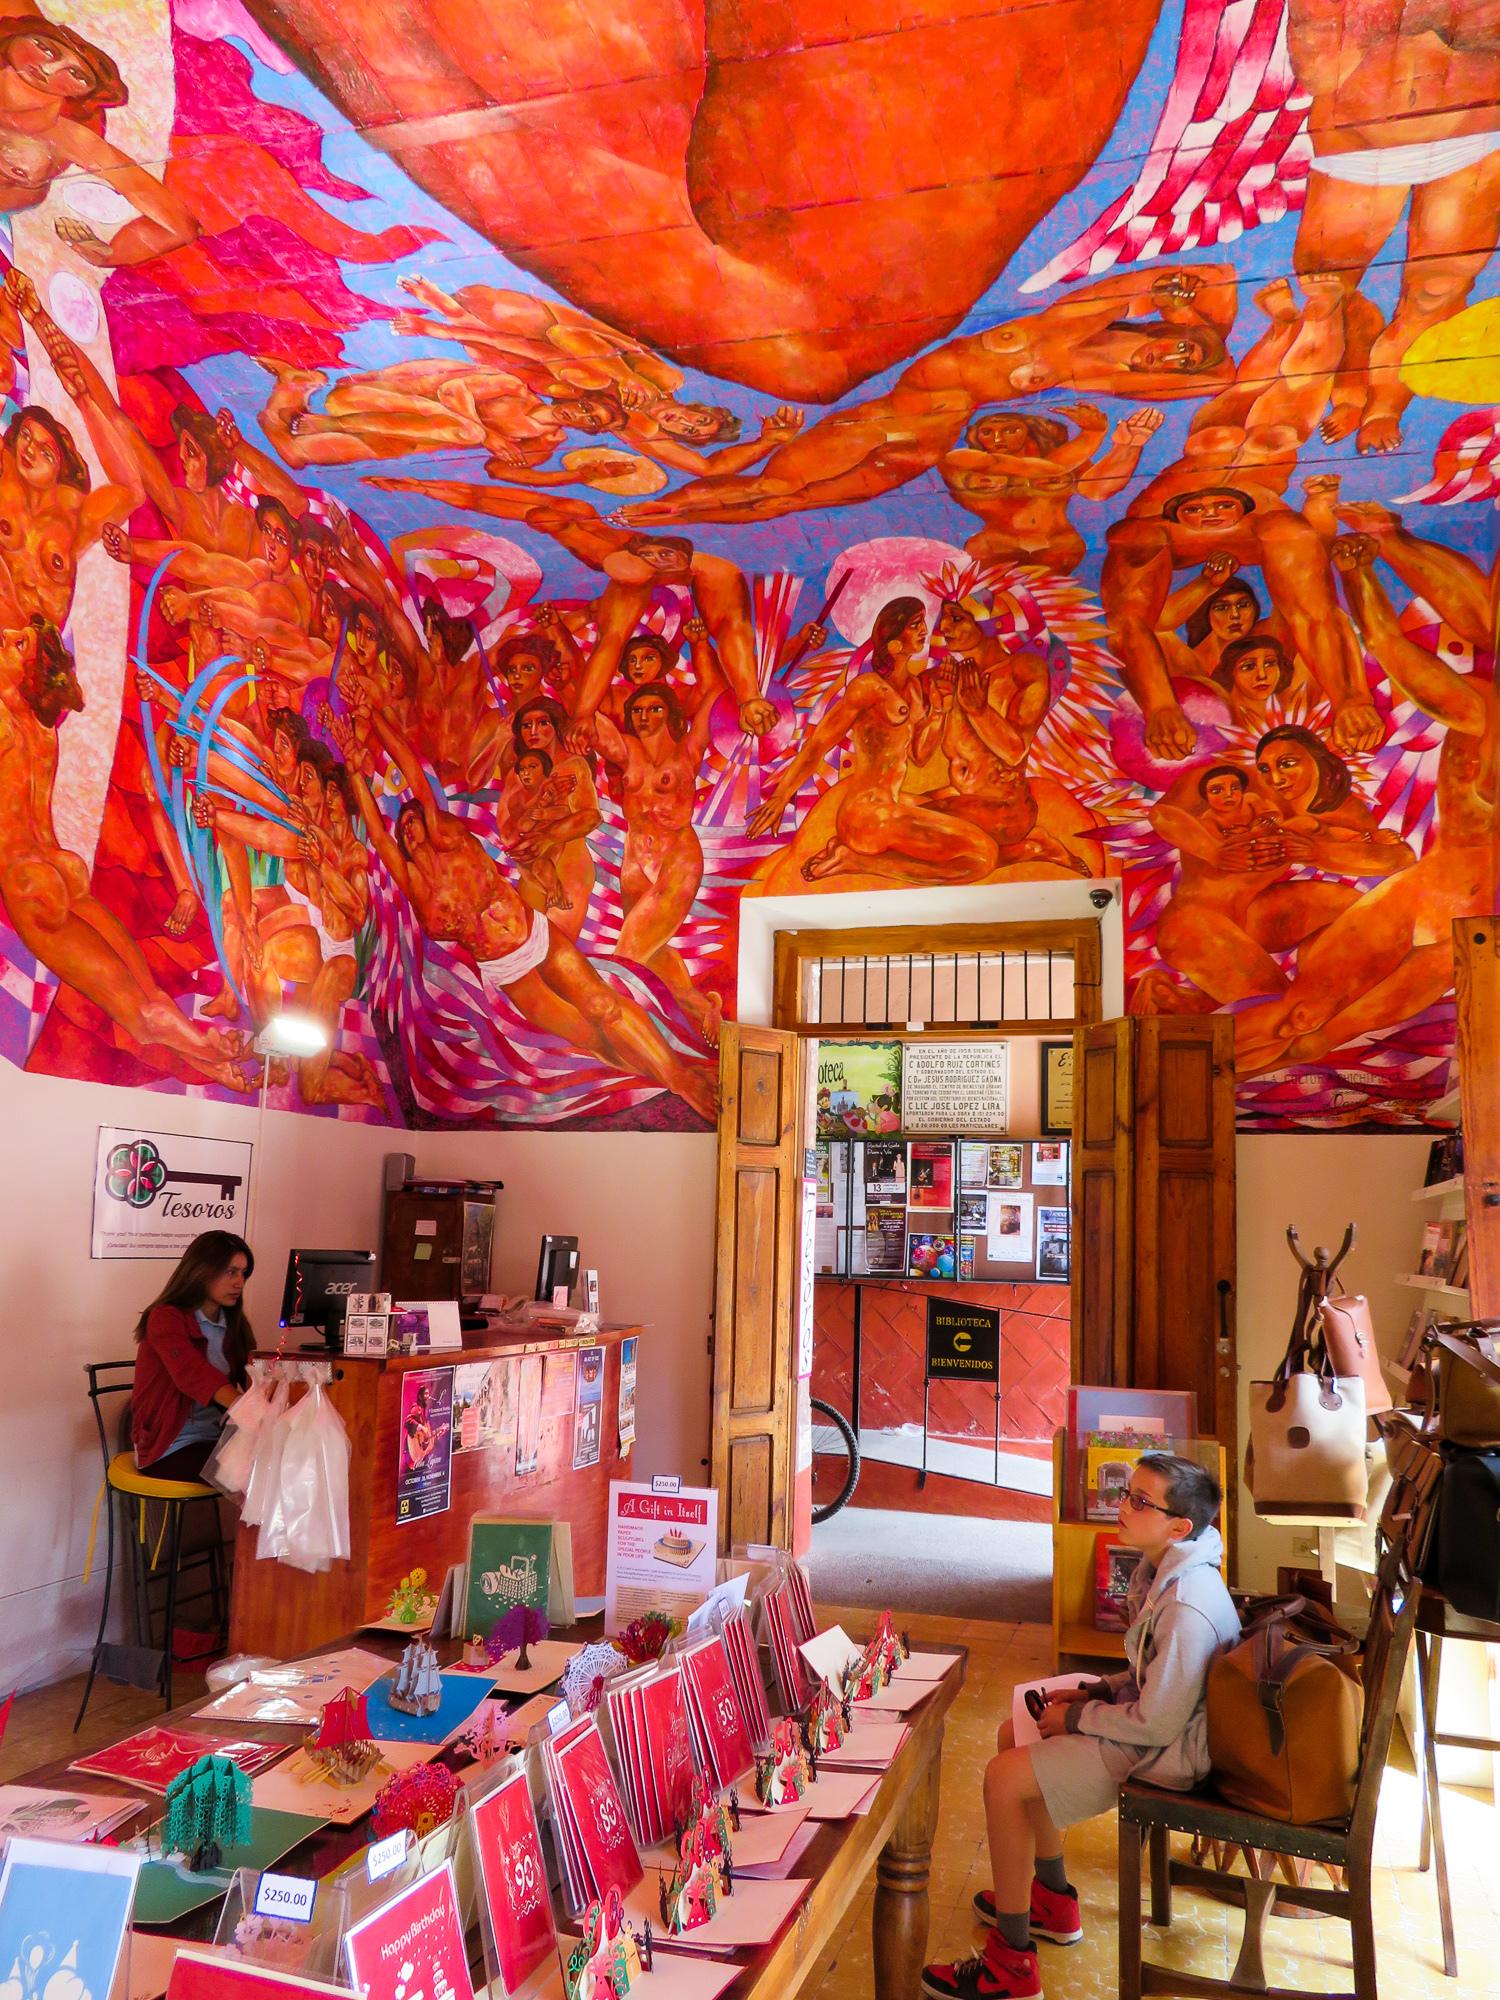 Biblioteca de San Miguel de Allende gift shop with its impressive mural